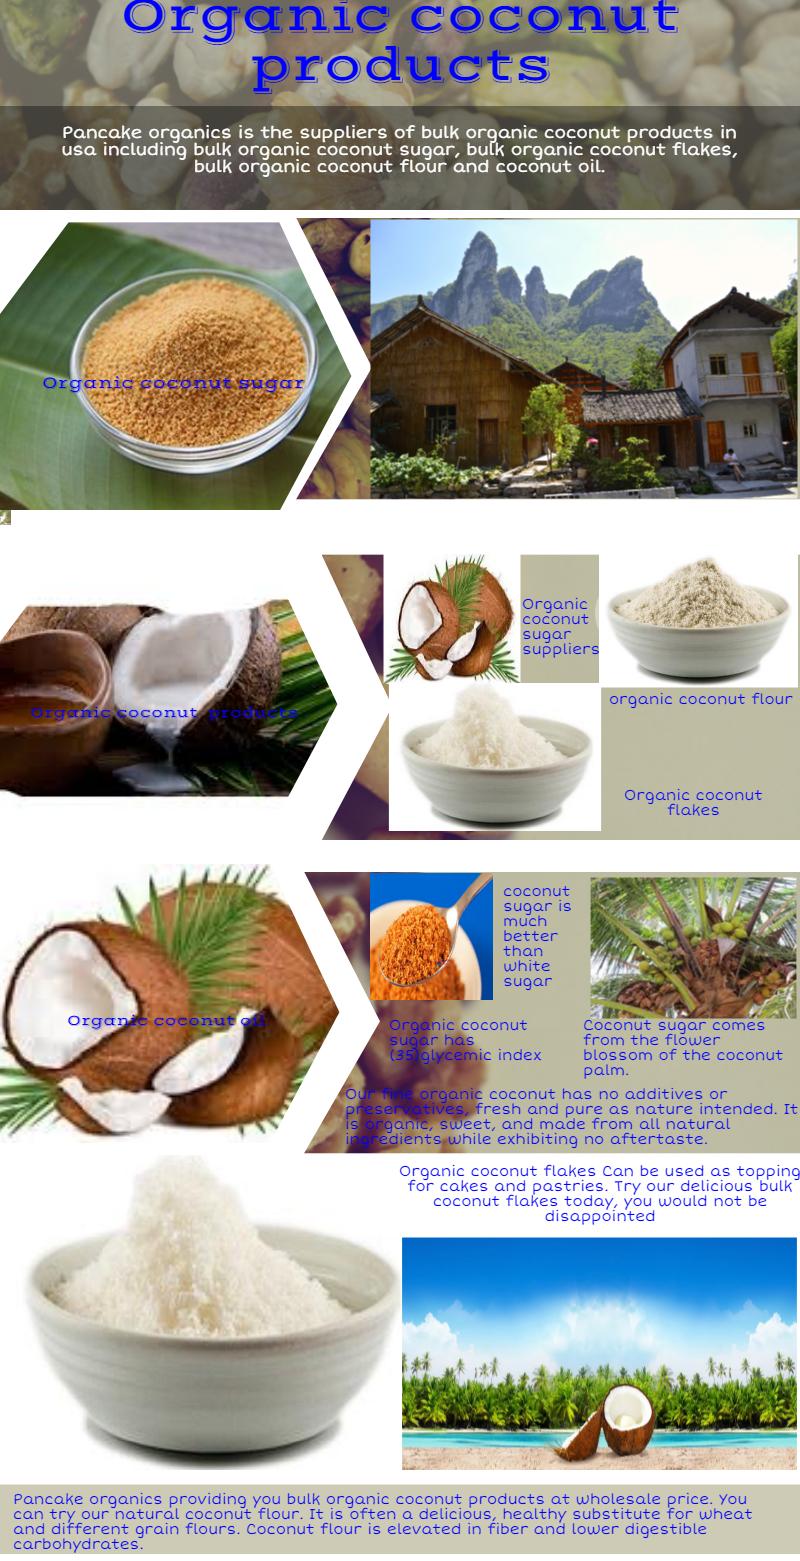 Contact pancake organics to buy bulk amount of organic coconut